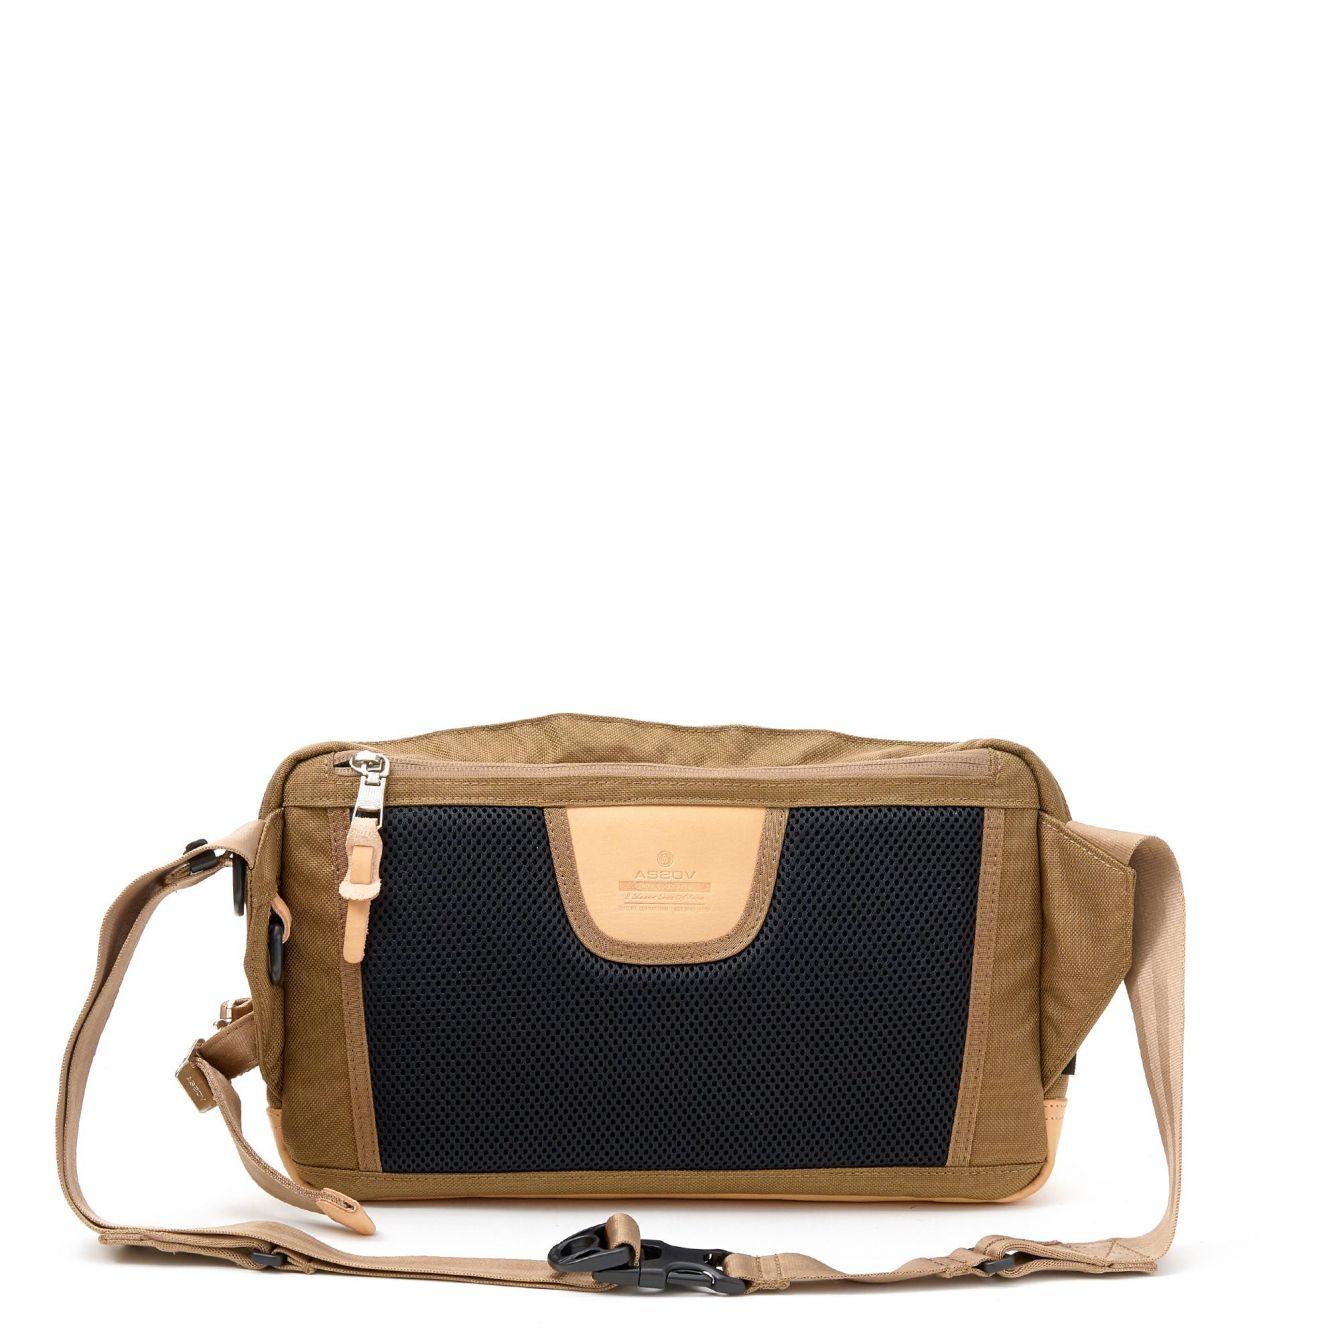 # 「AS2OV」包袋品牌獨家彈道尼龍:2WAY SHOULDER & BODY BAG 新品上市 15